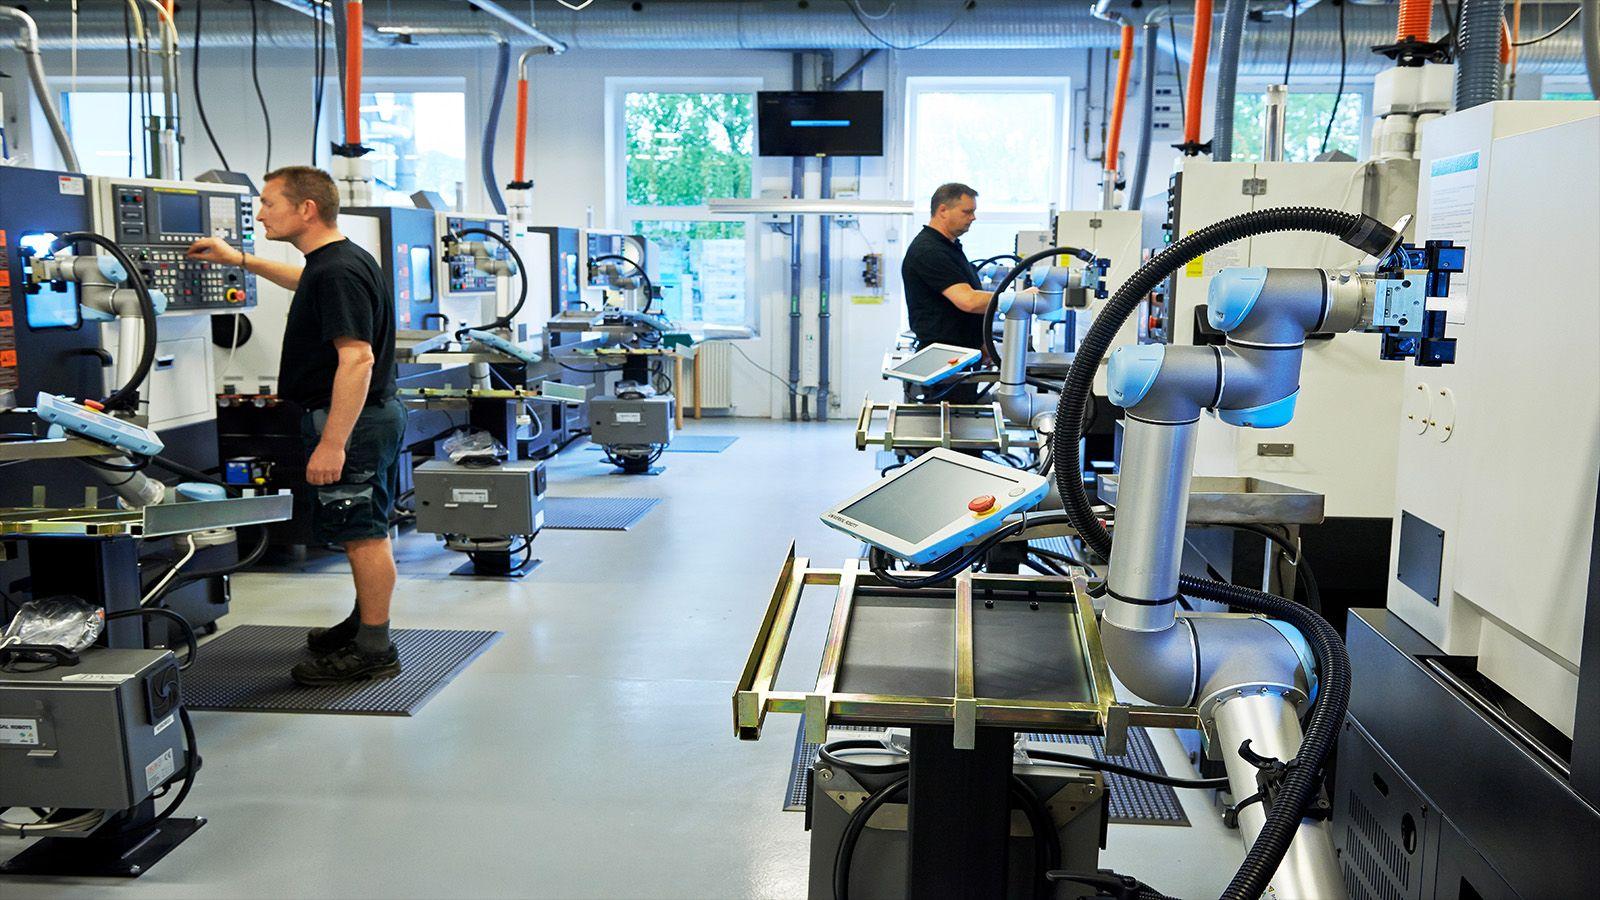 Robots Create Jobs New Research International Federation Of Robotics